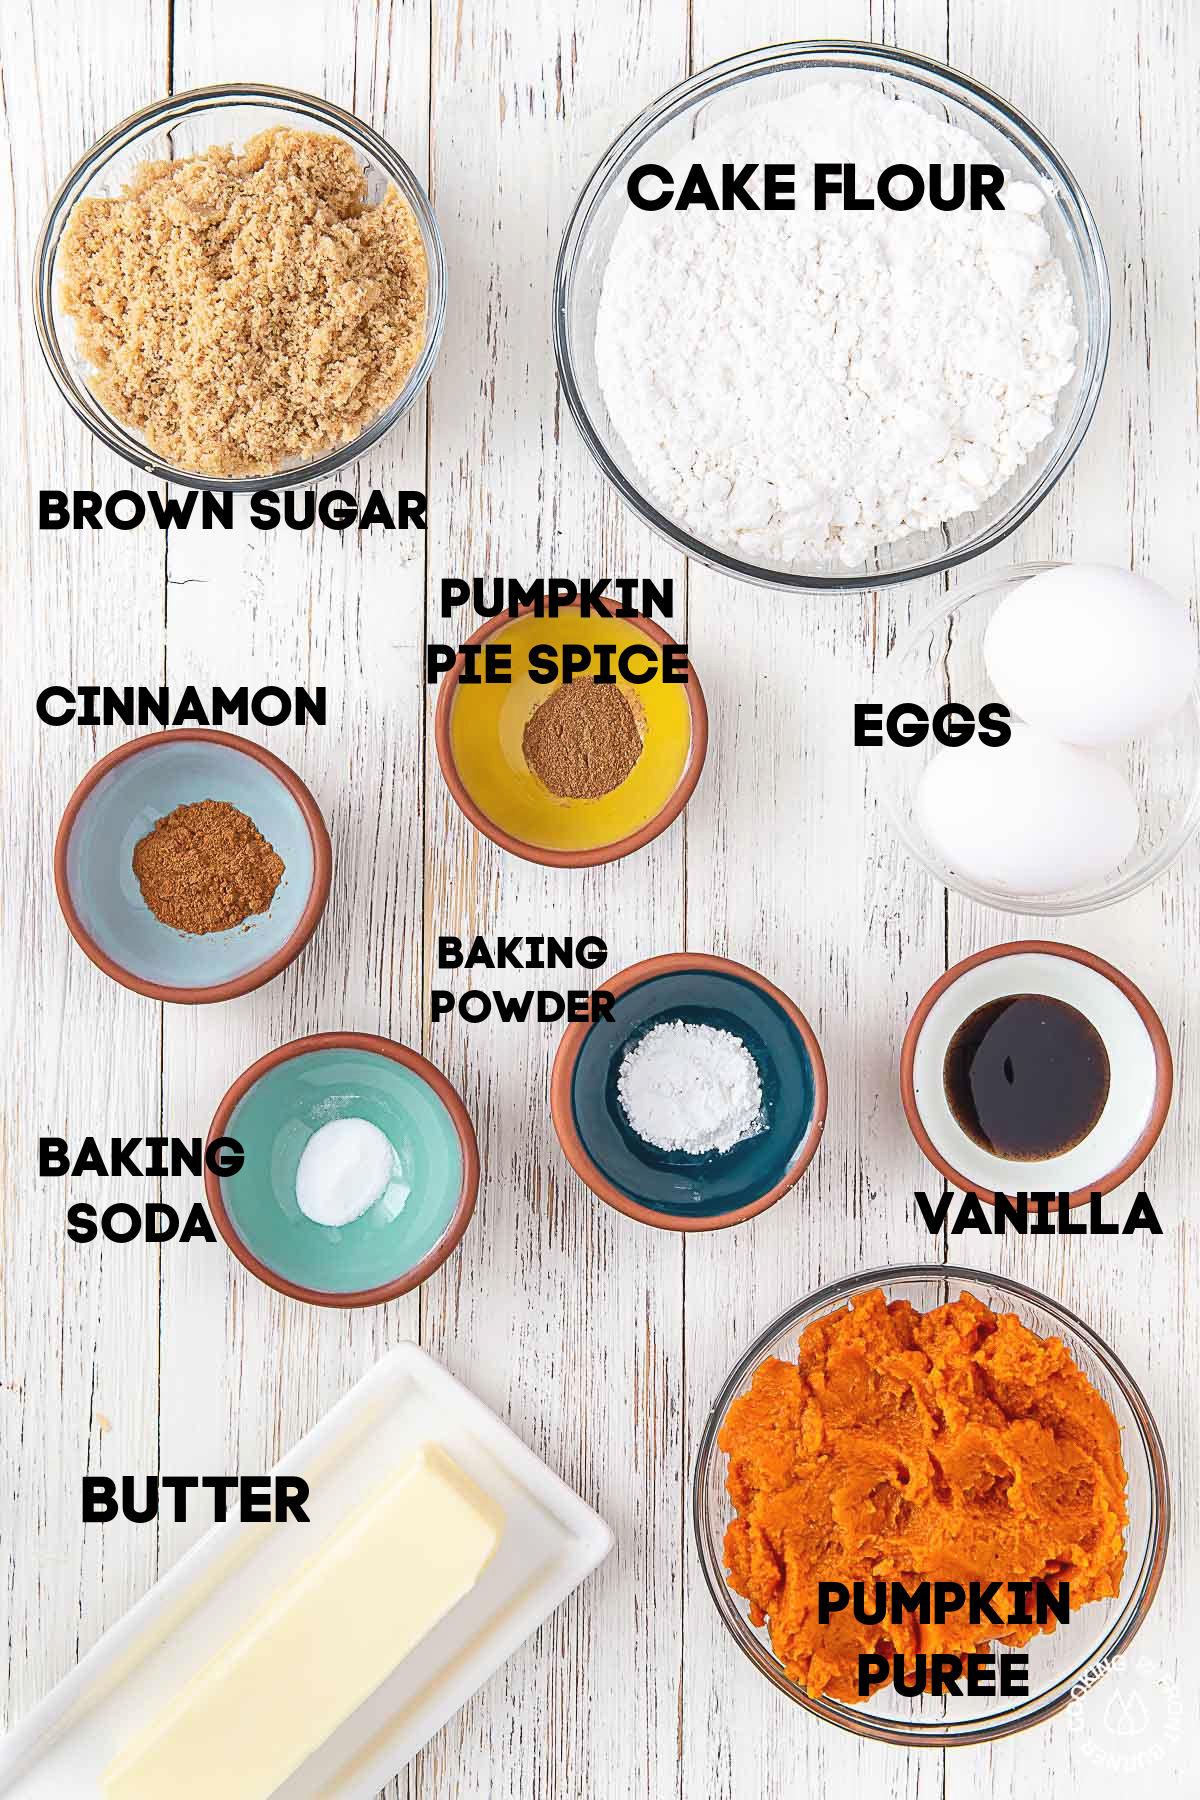 cake flour, brown sugar, eggs, cinnamon, pumpkin pie spice, baking soda, baking powder pumpkin puree butter in bowls